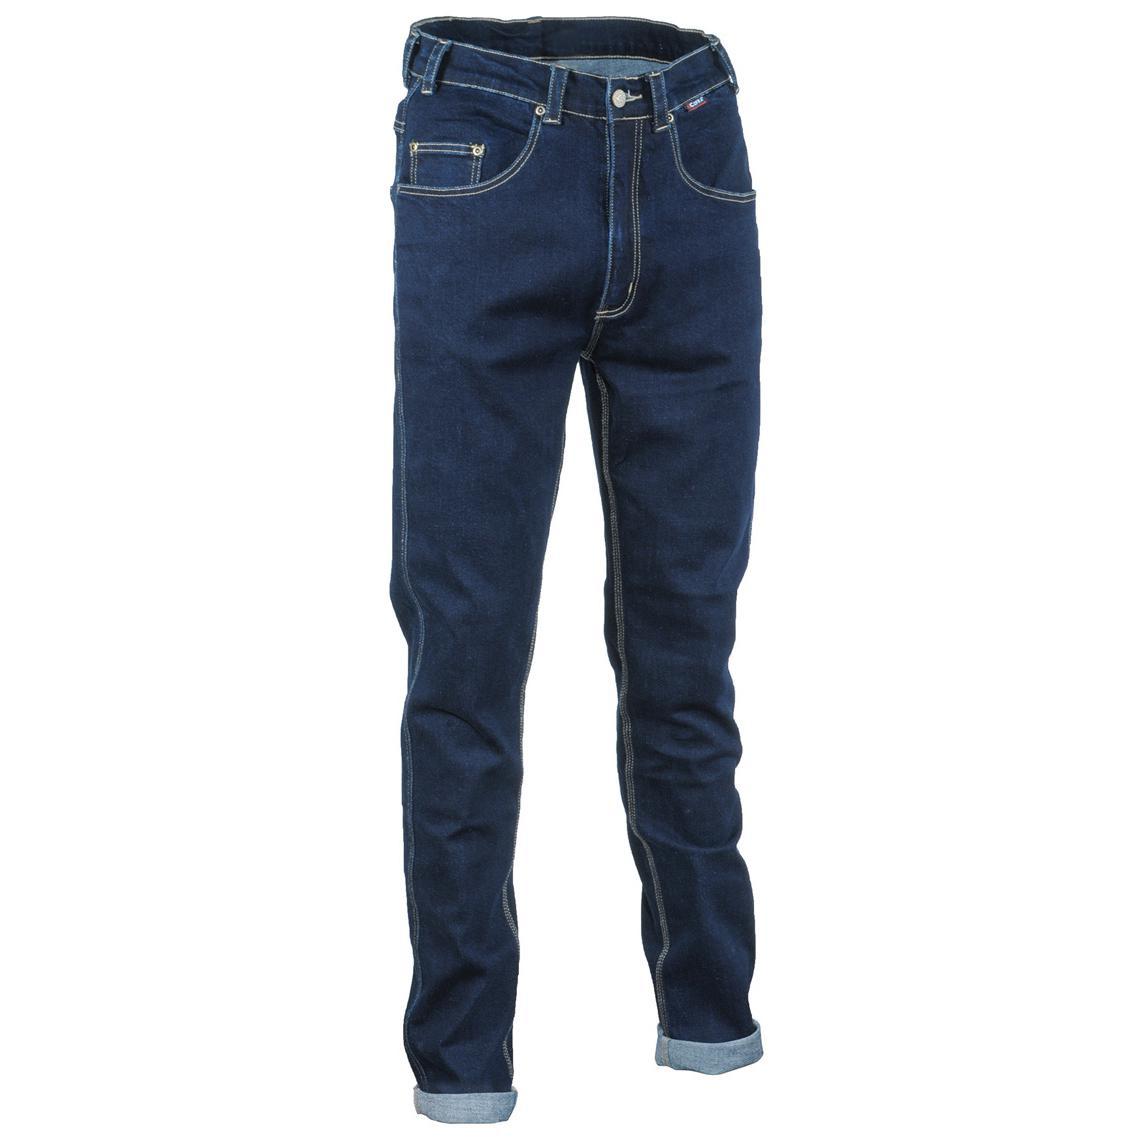 Pantaloni da lavoro da uomo COFRA ASTORGA Vendita Online ba6ced6d19a